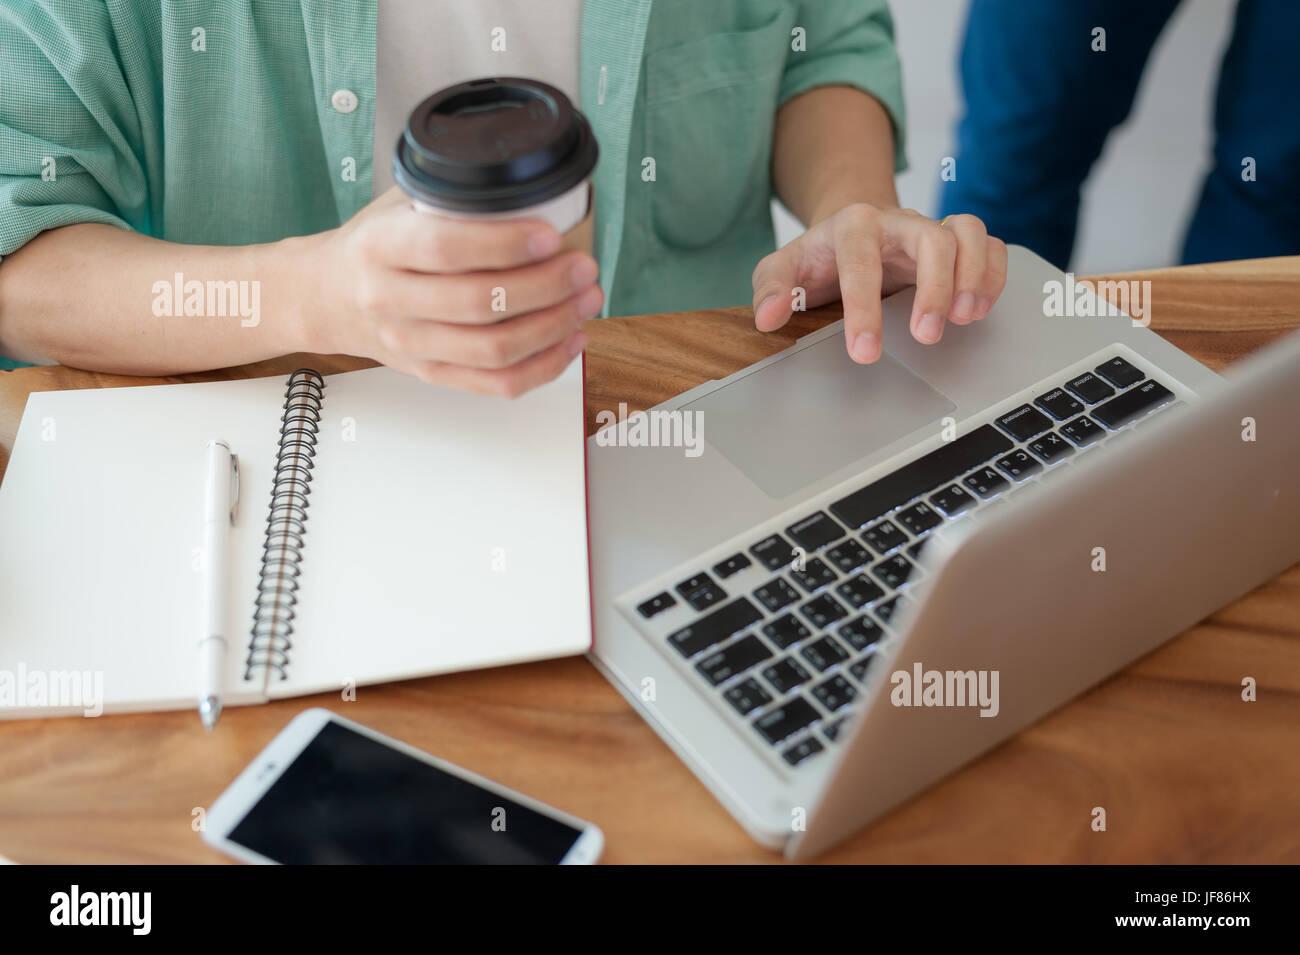 Hipster asiático masculino con paños casual utilizando equipo portátil touchpad mientras tomaba un Imagen De Stock